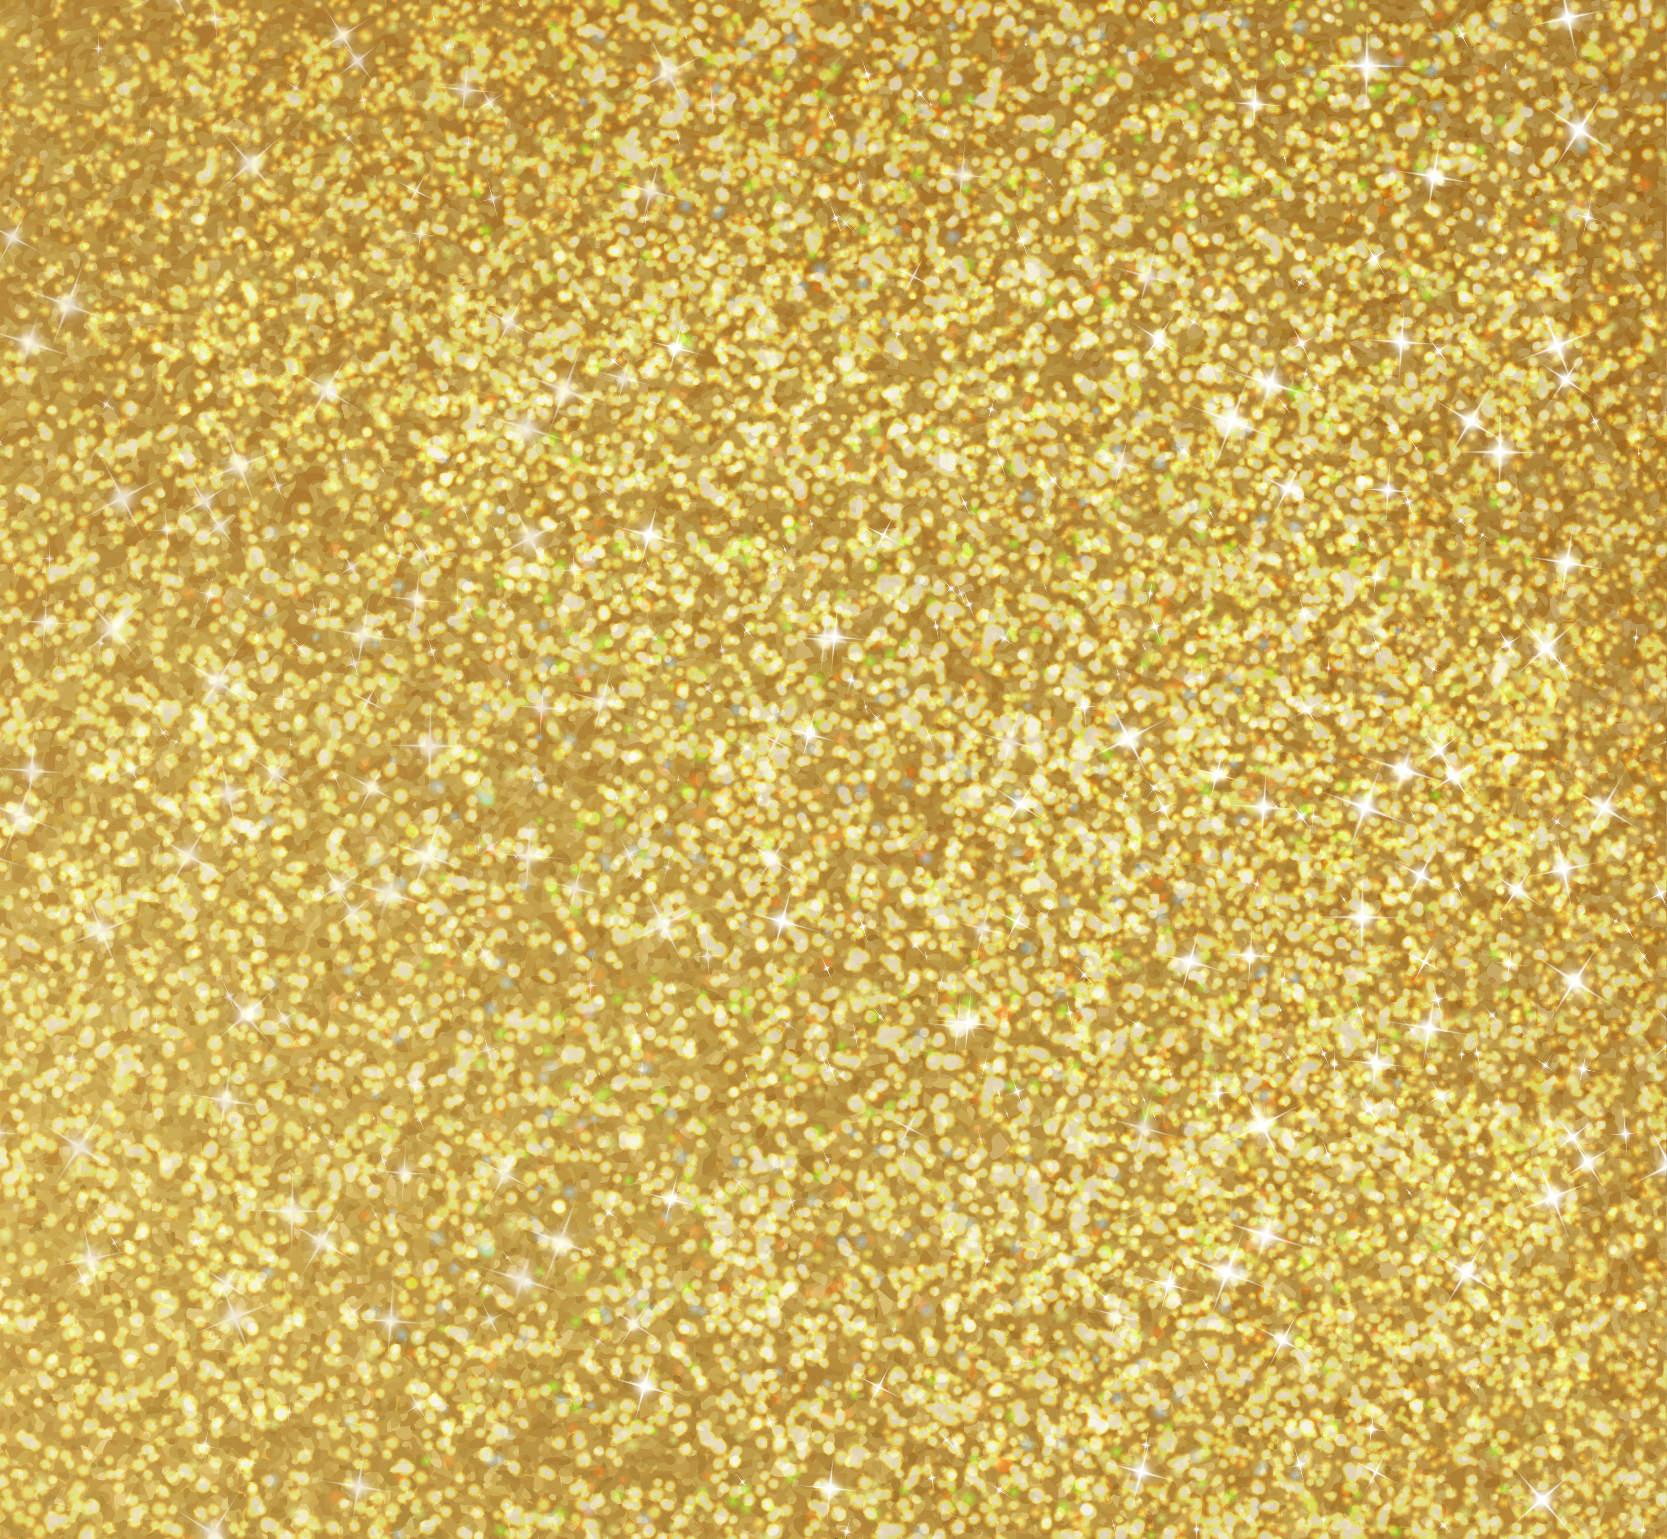 Gold Glitter Texture Free Vector